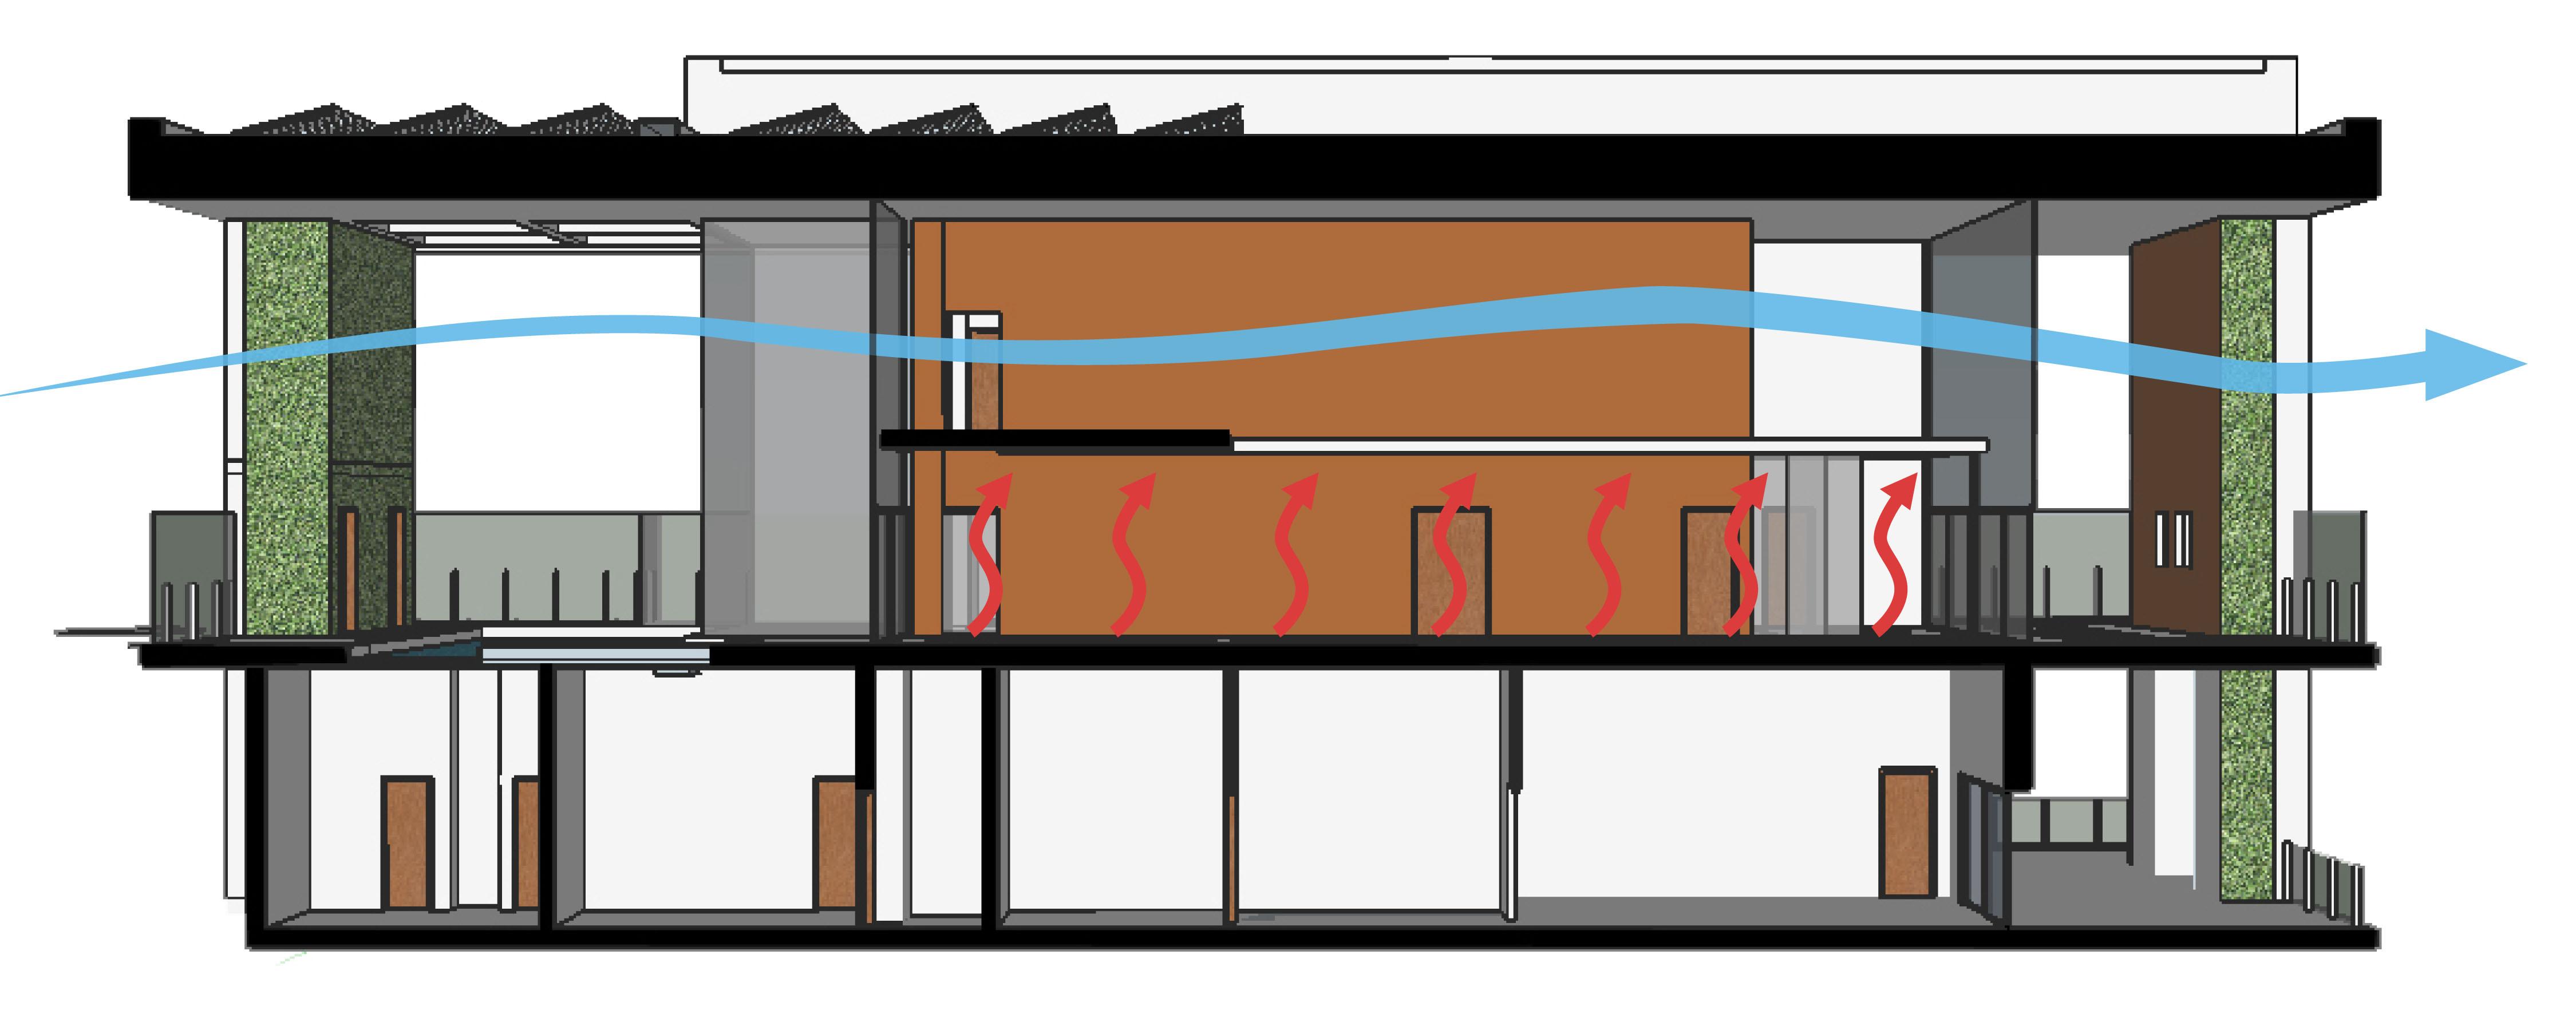 arquitetura-bioclimatica